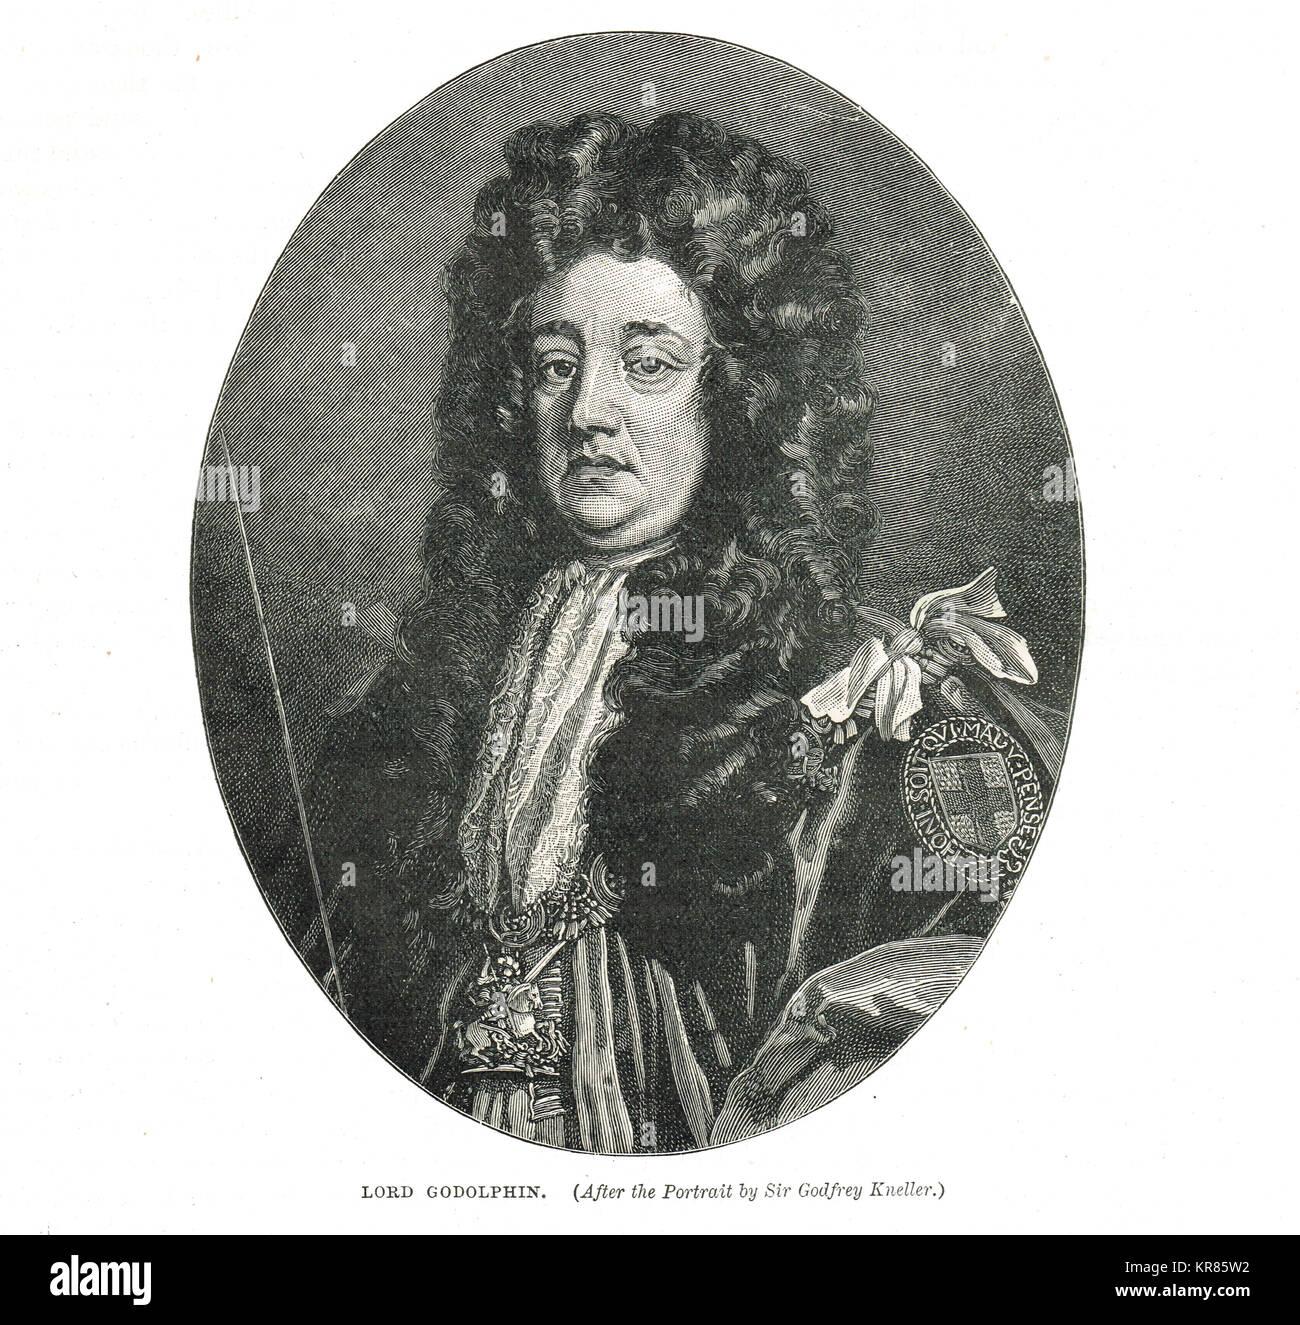 Sidney Godolphin, 1st Earl of Godolphin, 1645-1712 - Stock Image